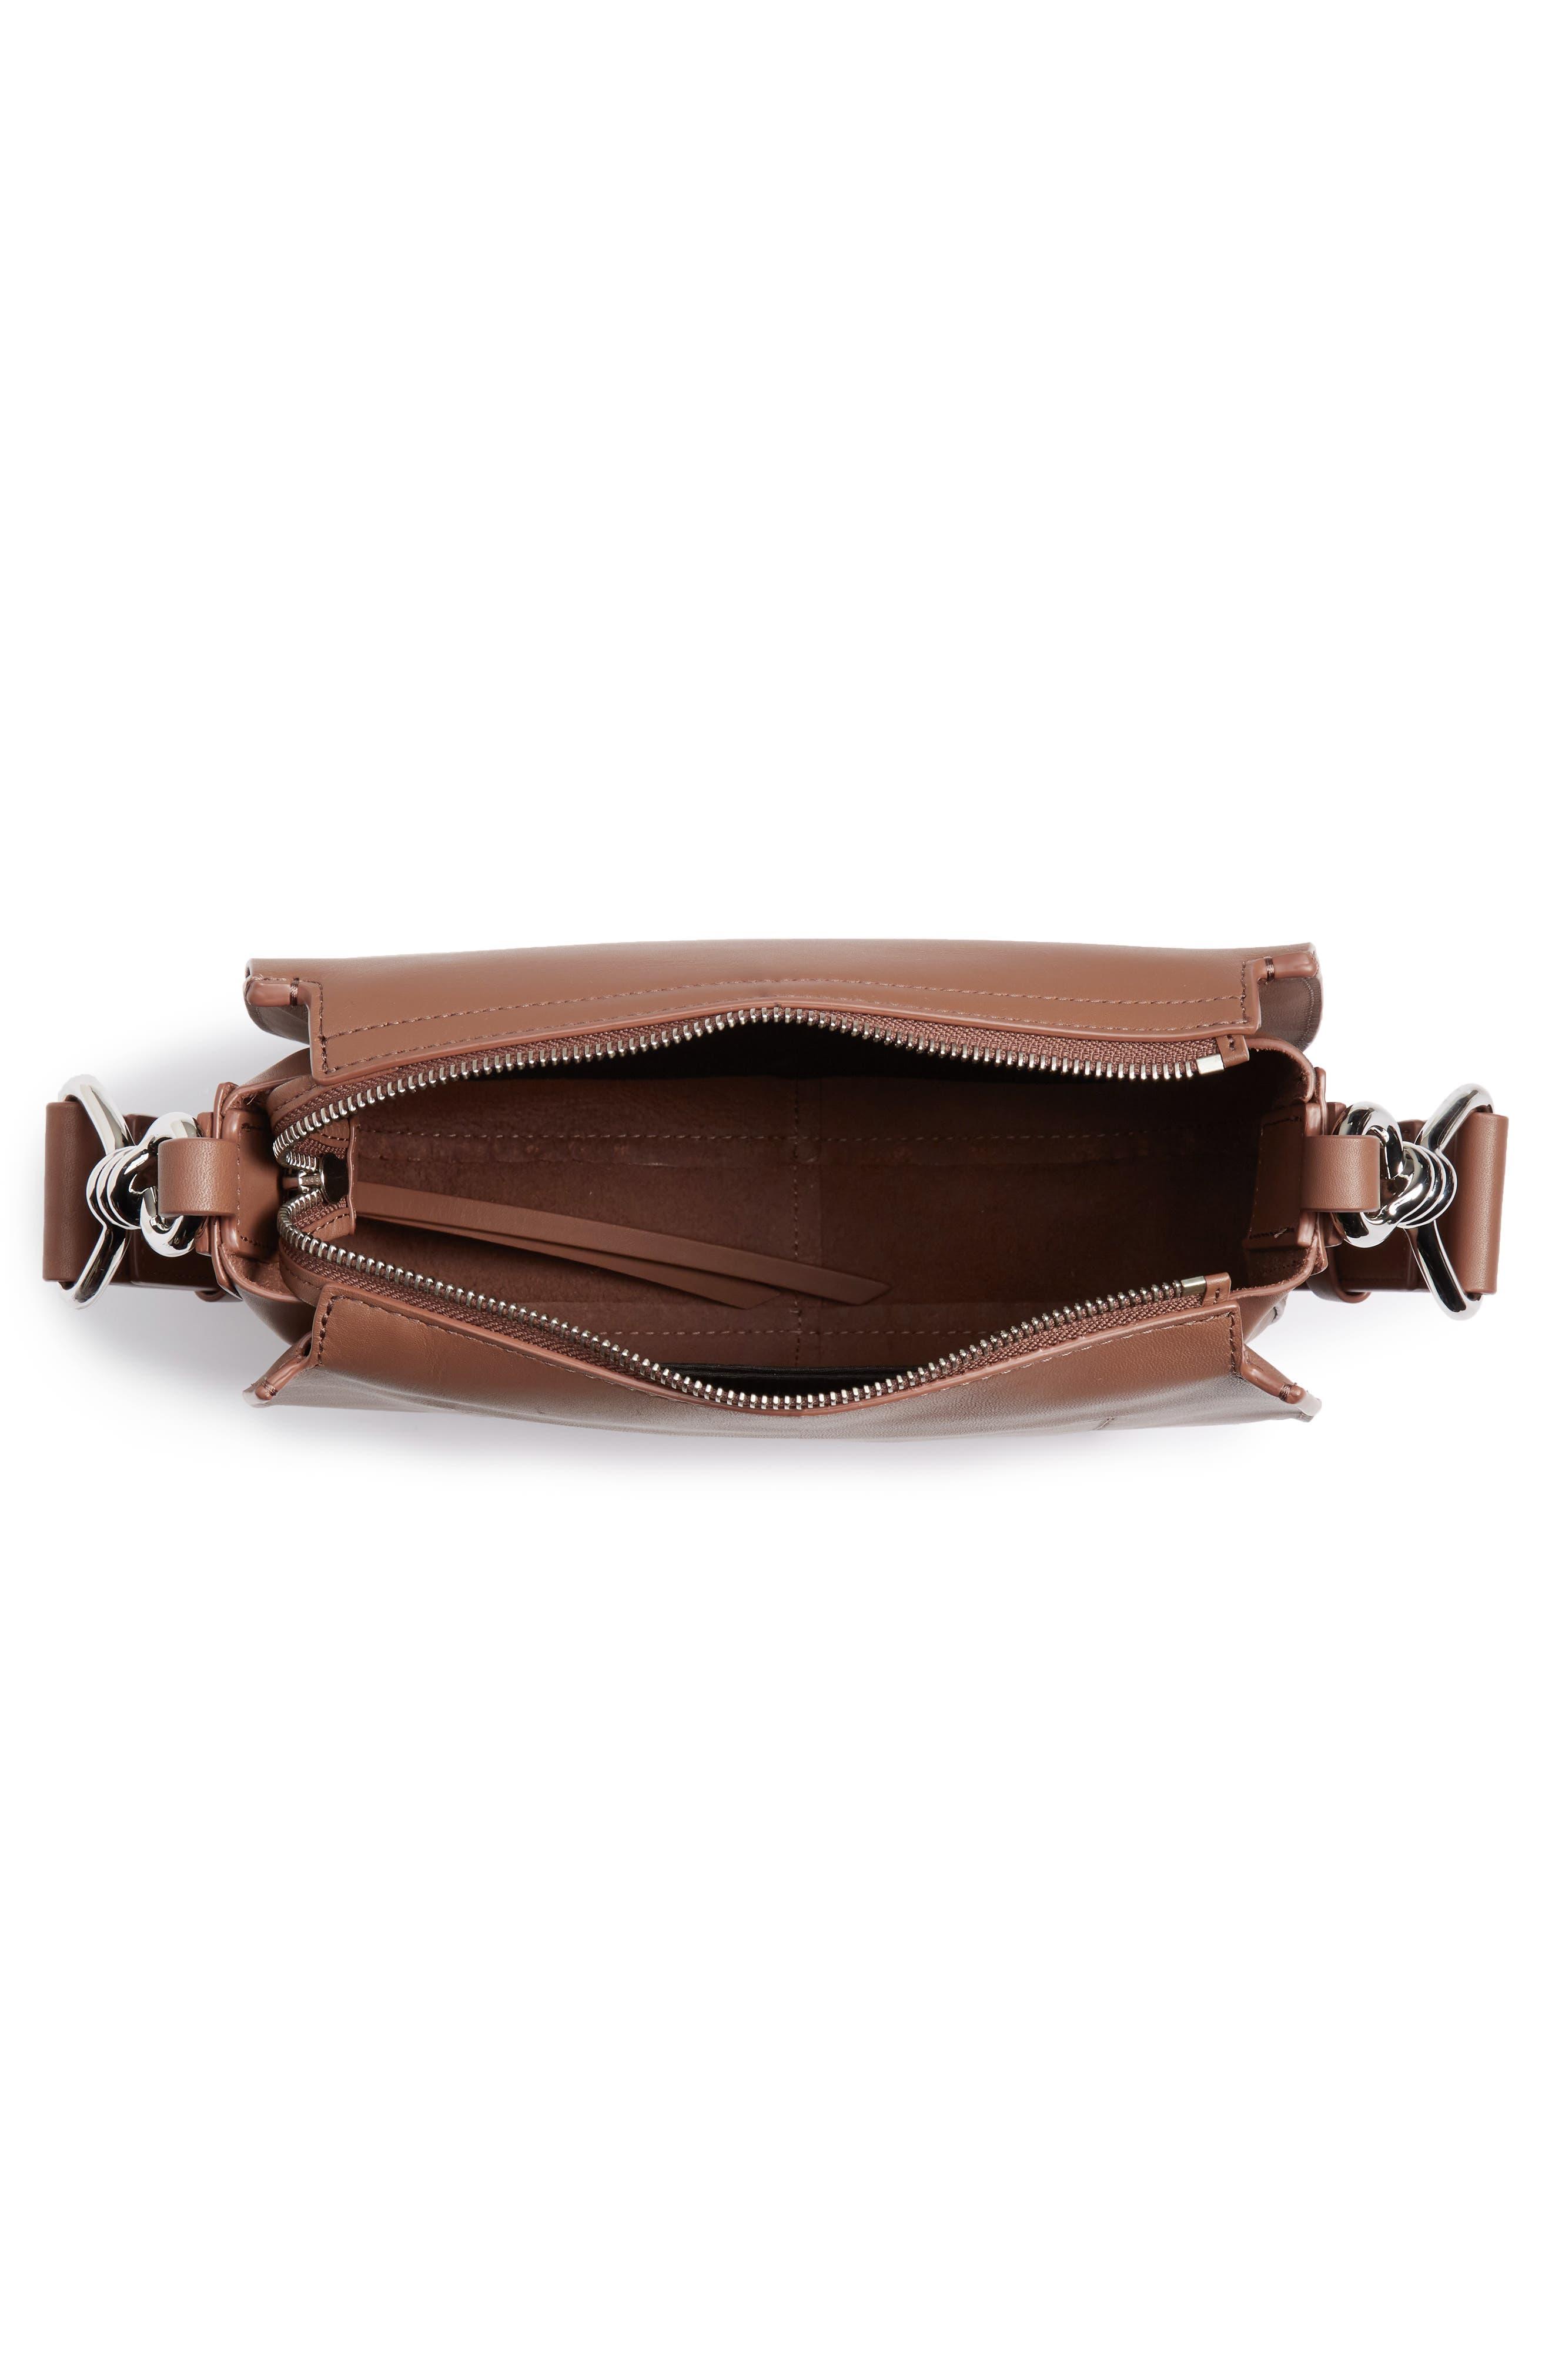 ALLSAINTS, Captain Round Leather Crossbody Bag, Alternate thumbnail 4, color, MILK CHOCOLATE